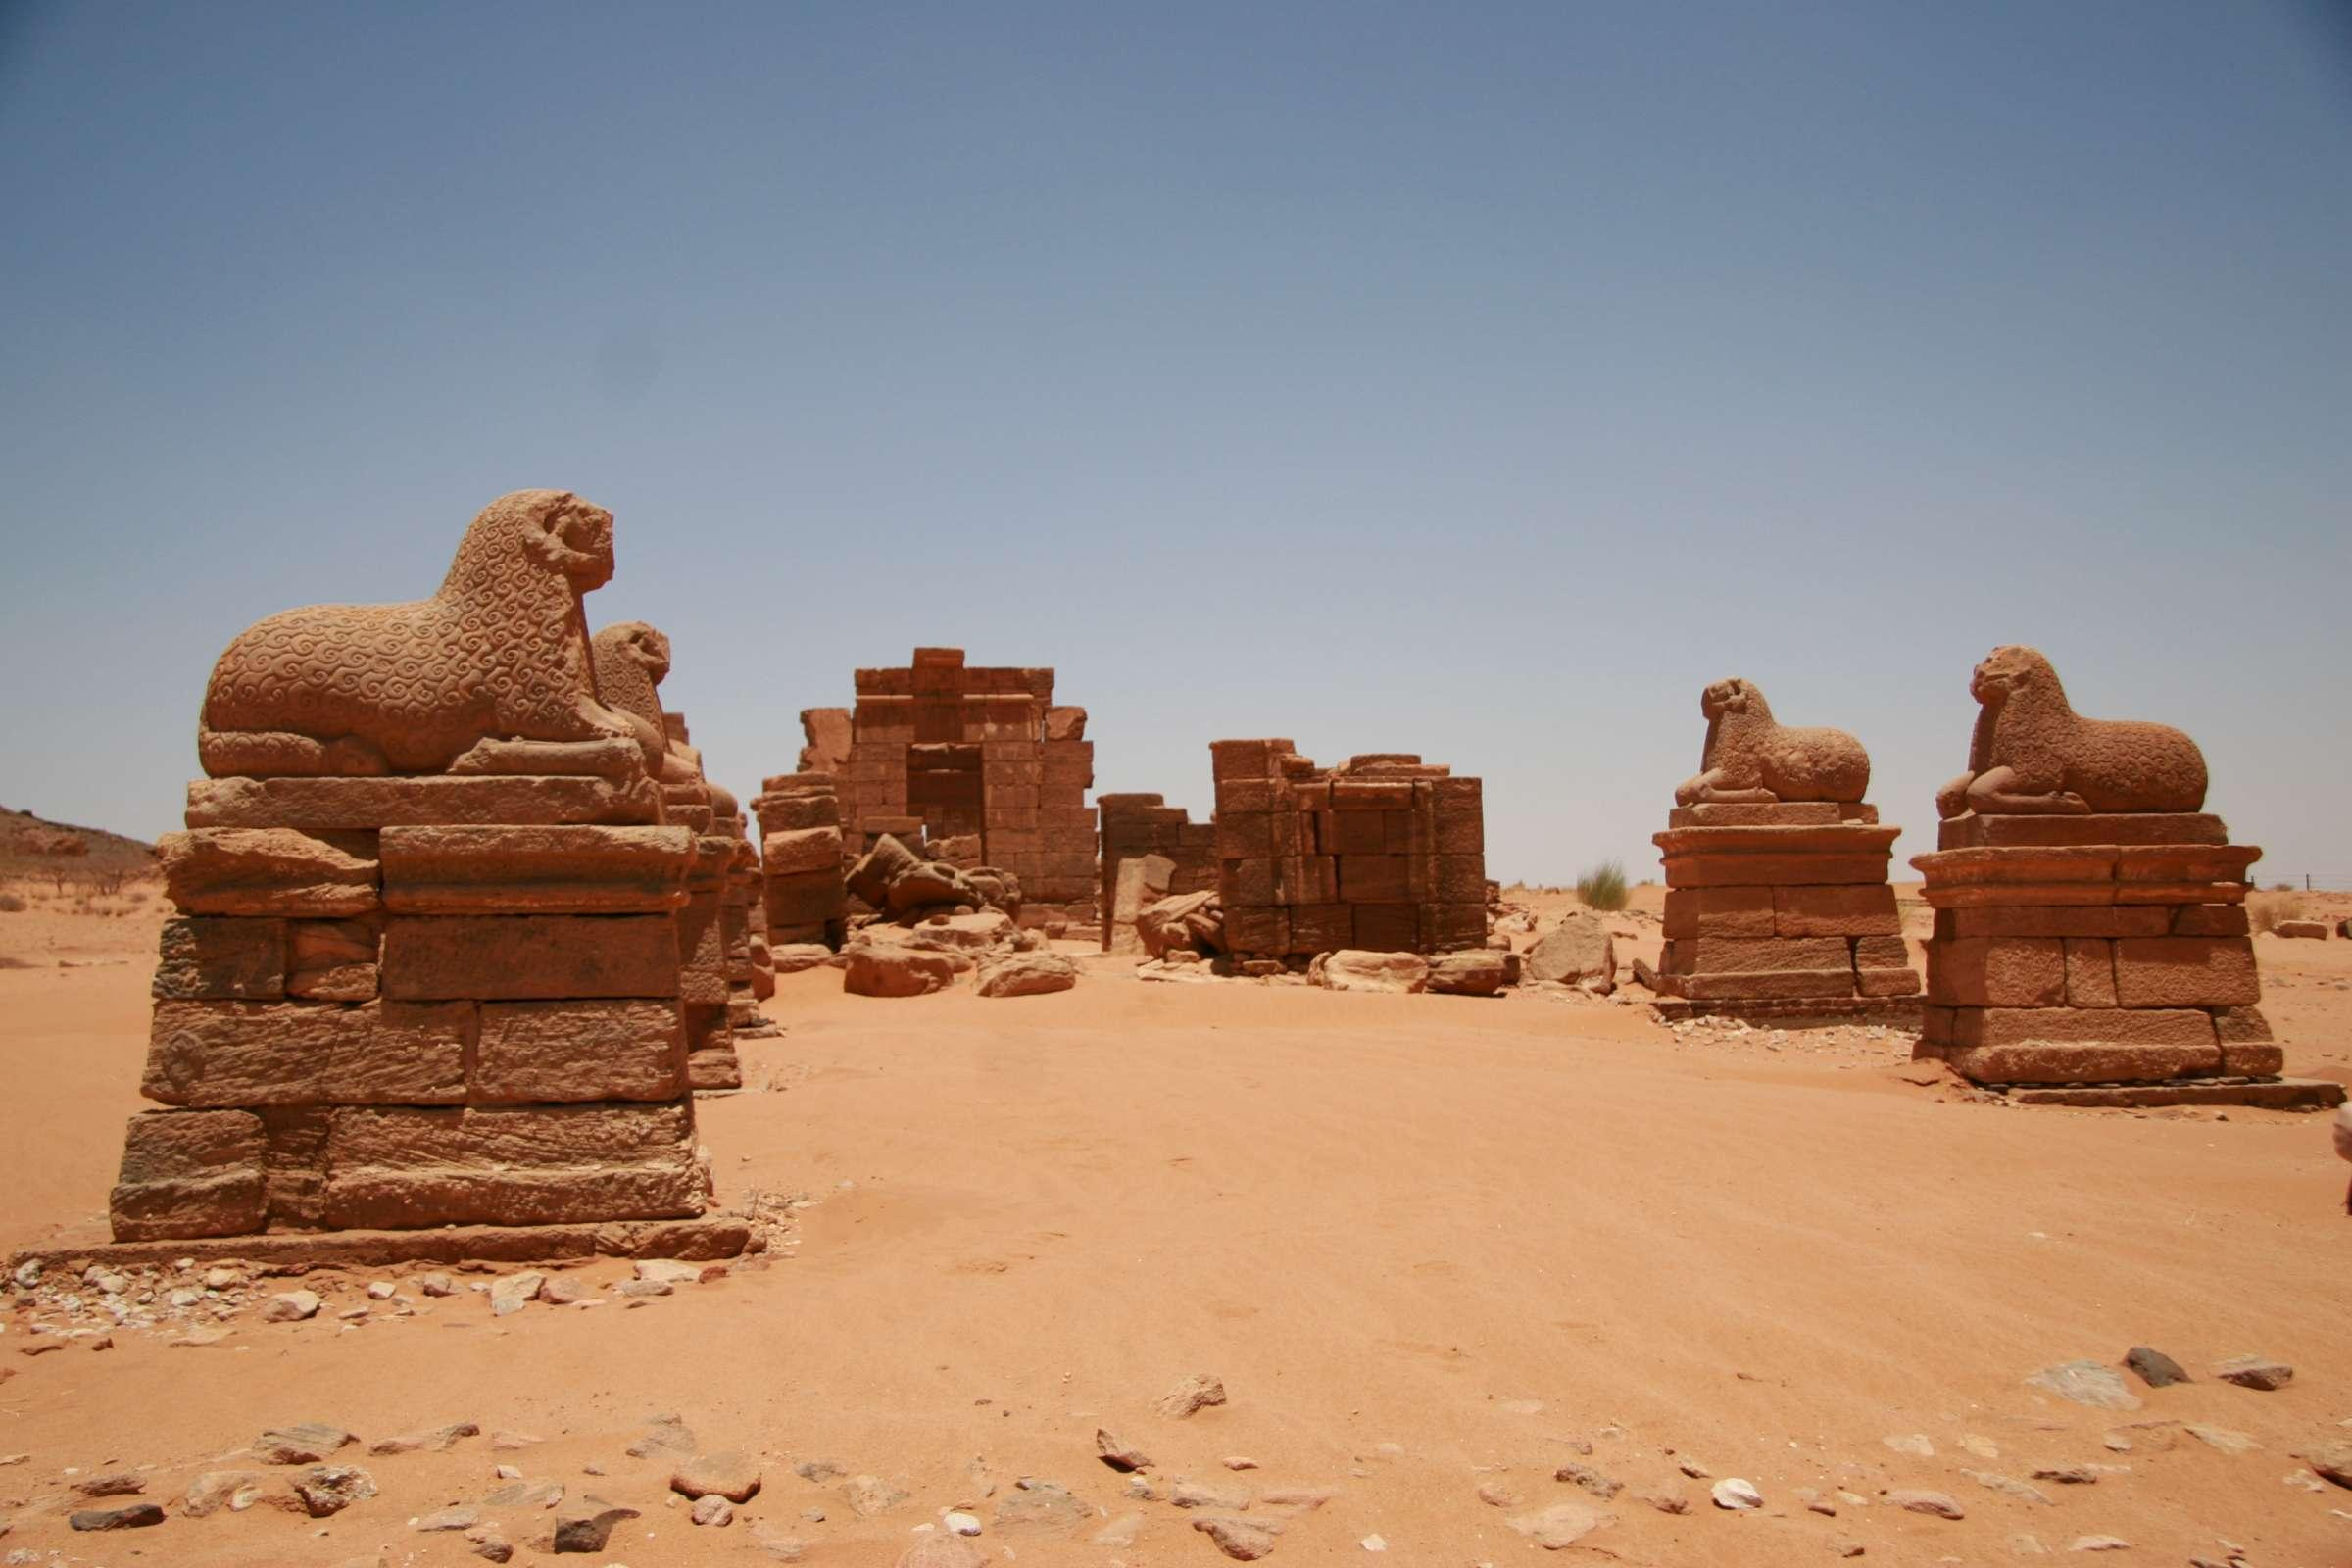 Nubia 2008 PiramidiKhartoum 4jpg 0 AD A free open source